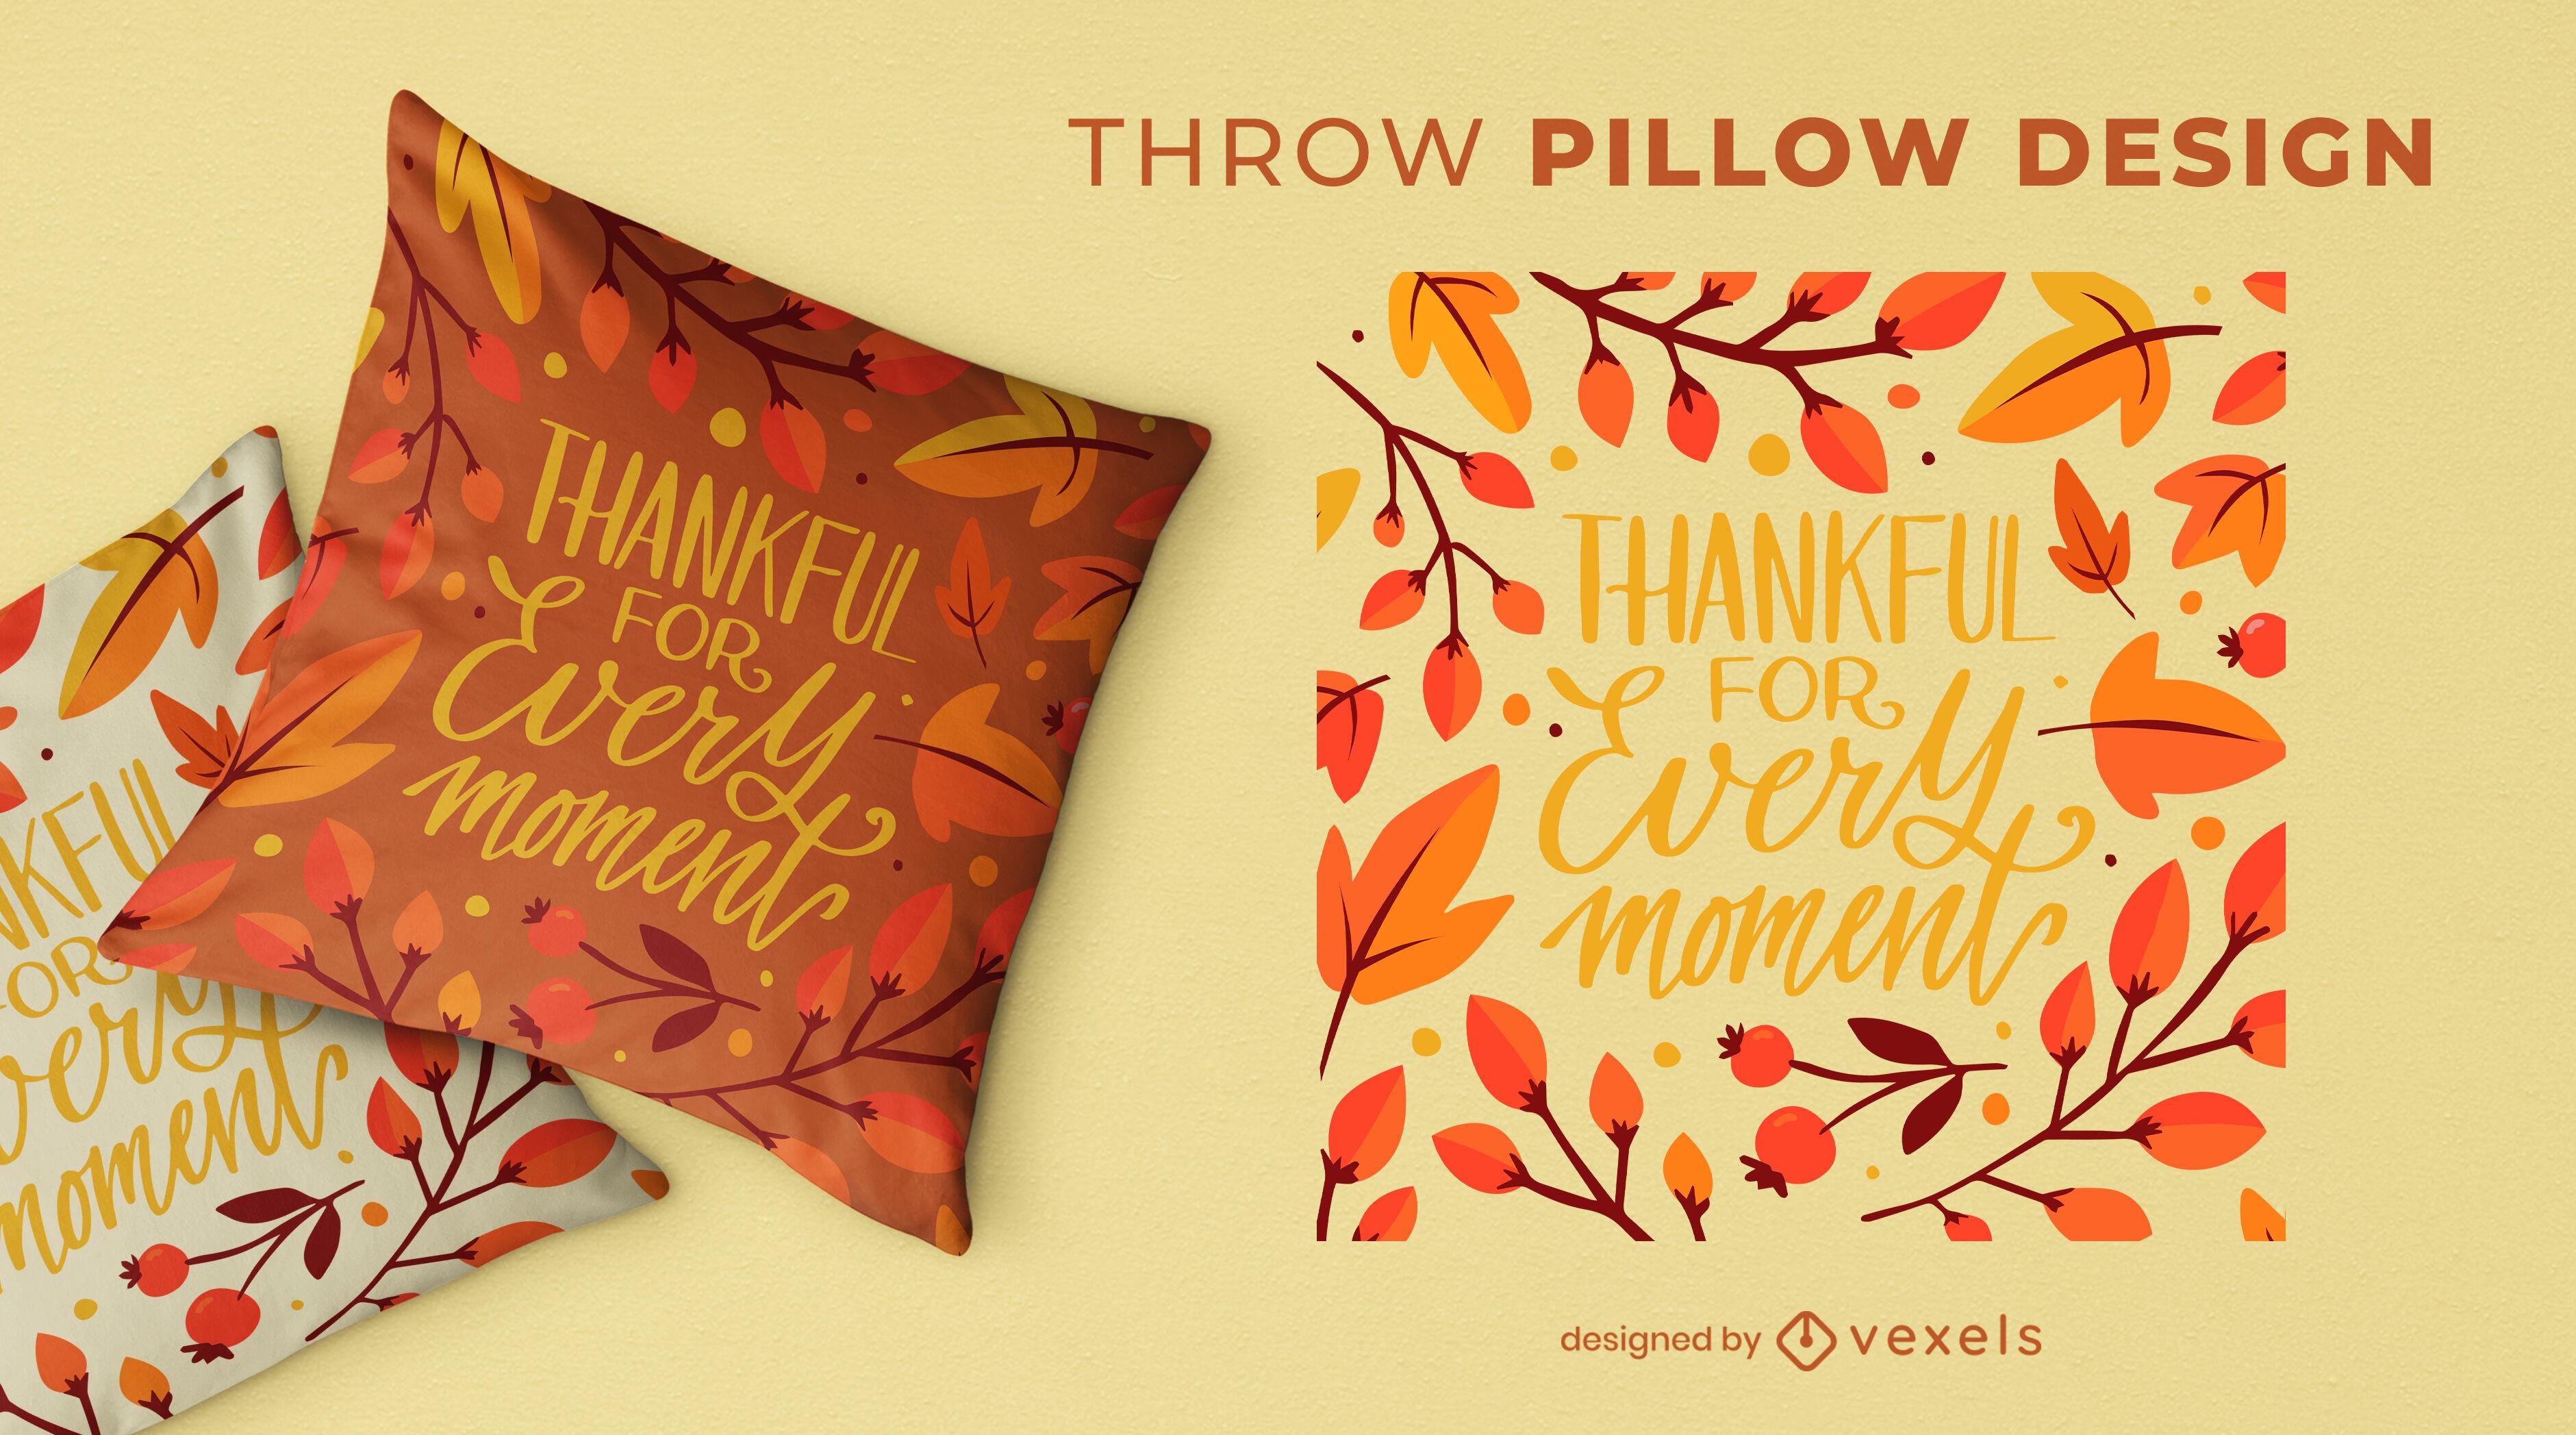 Thanksgiving lettering throw pillow design